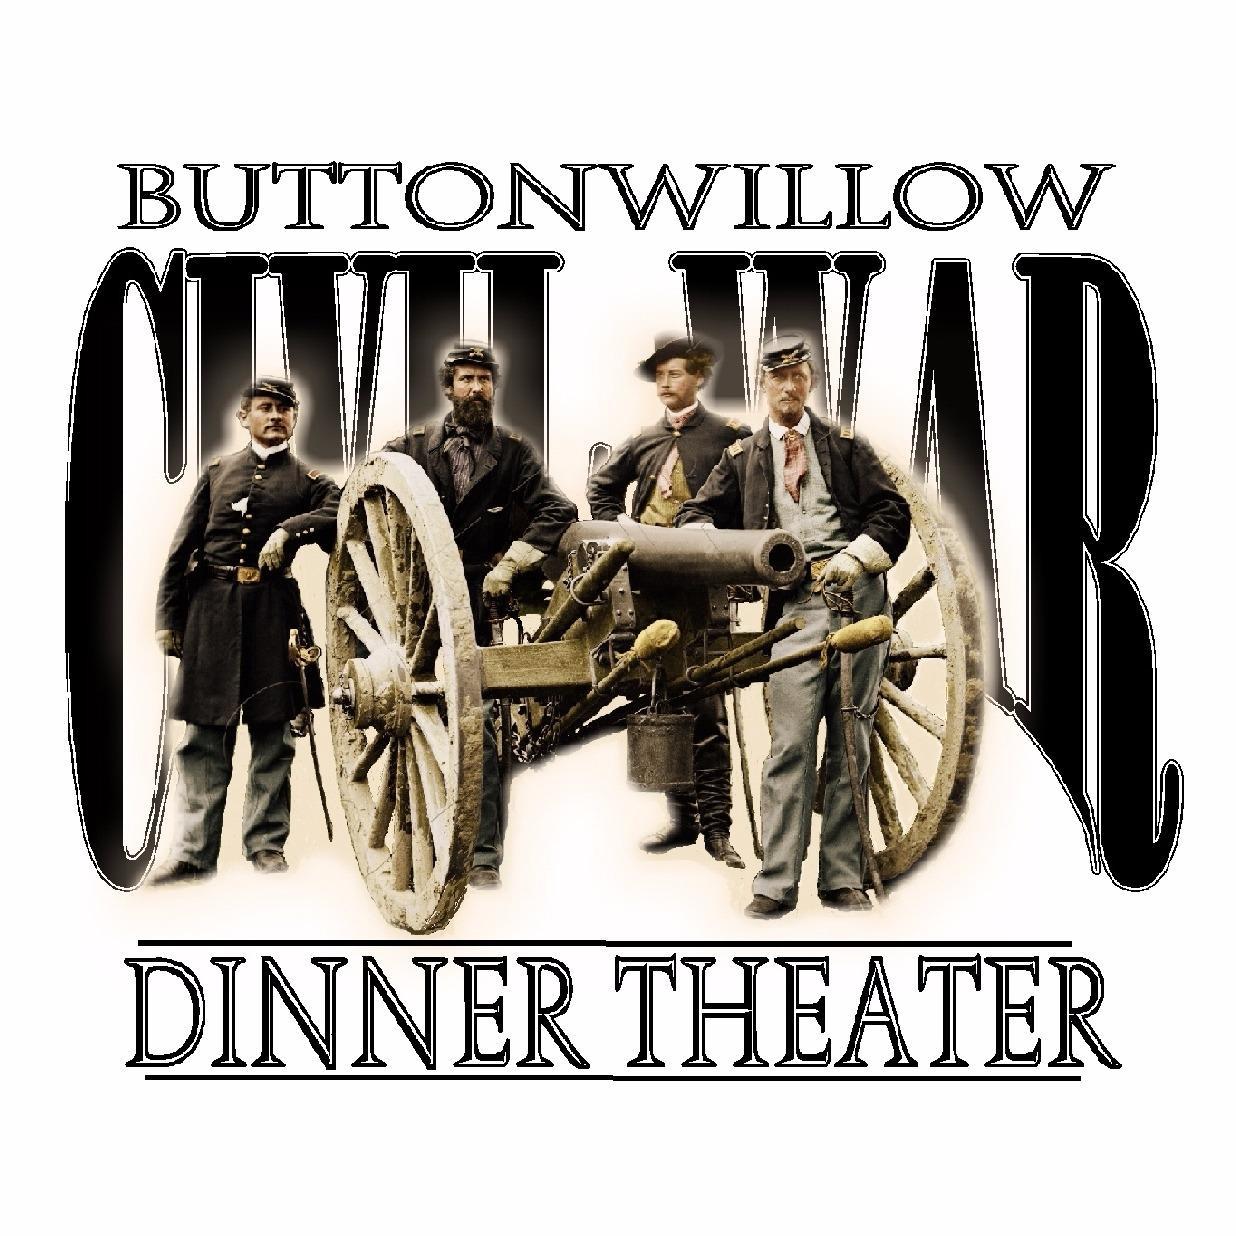 Buttonwillow Civil War Dinner Theater image 5